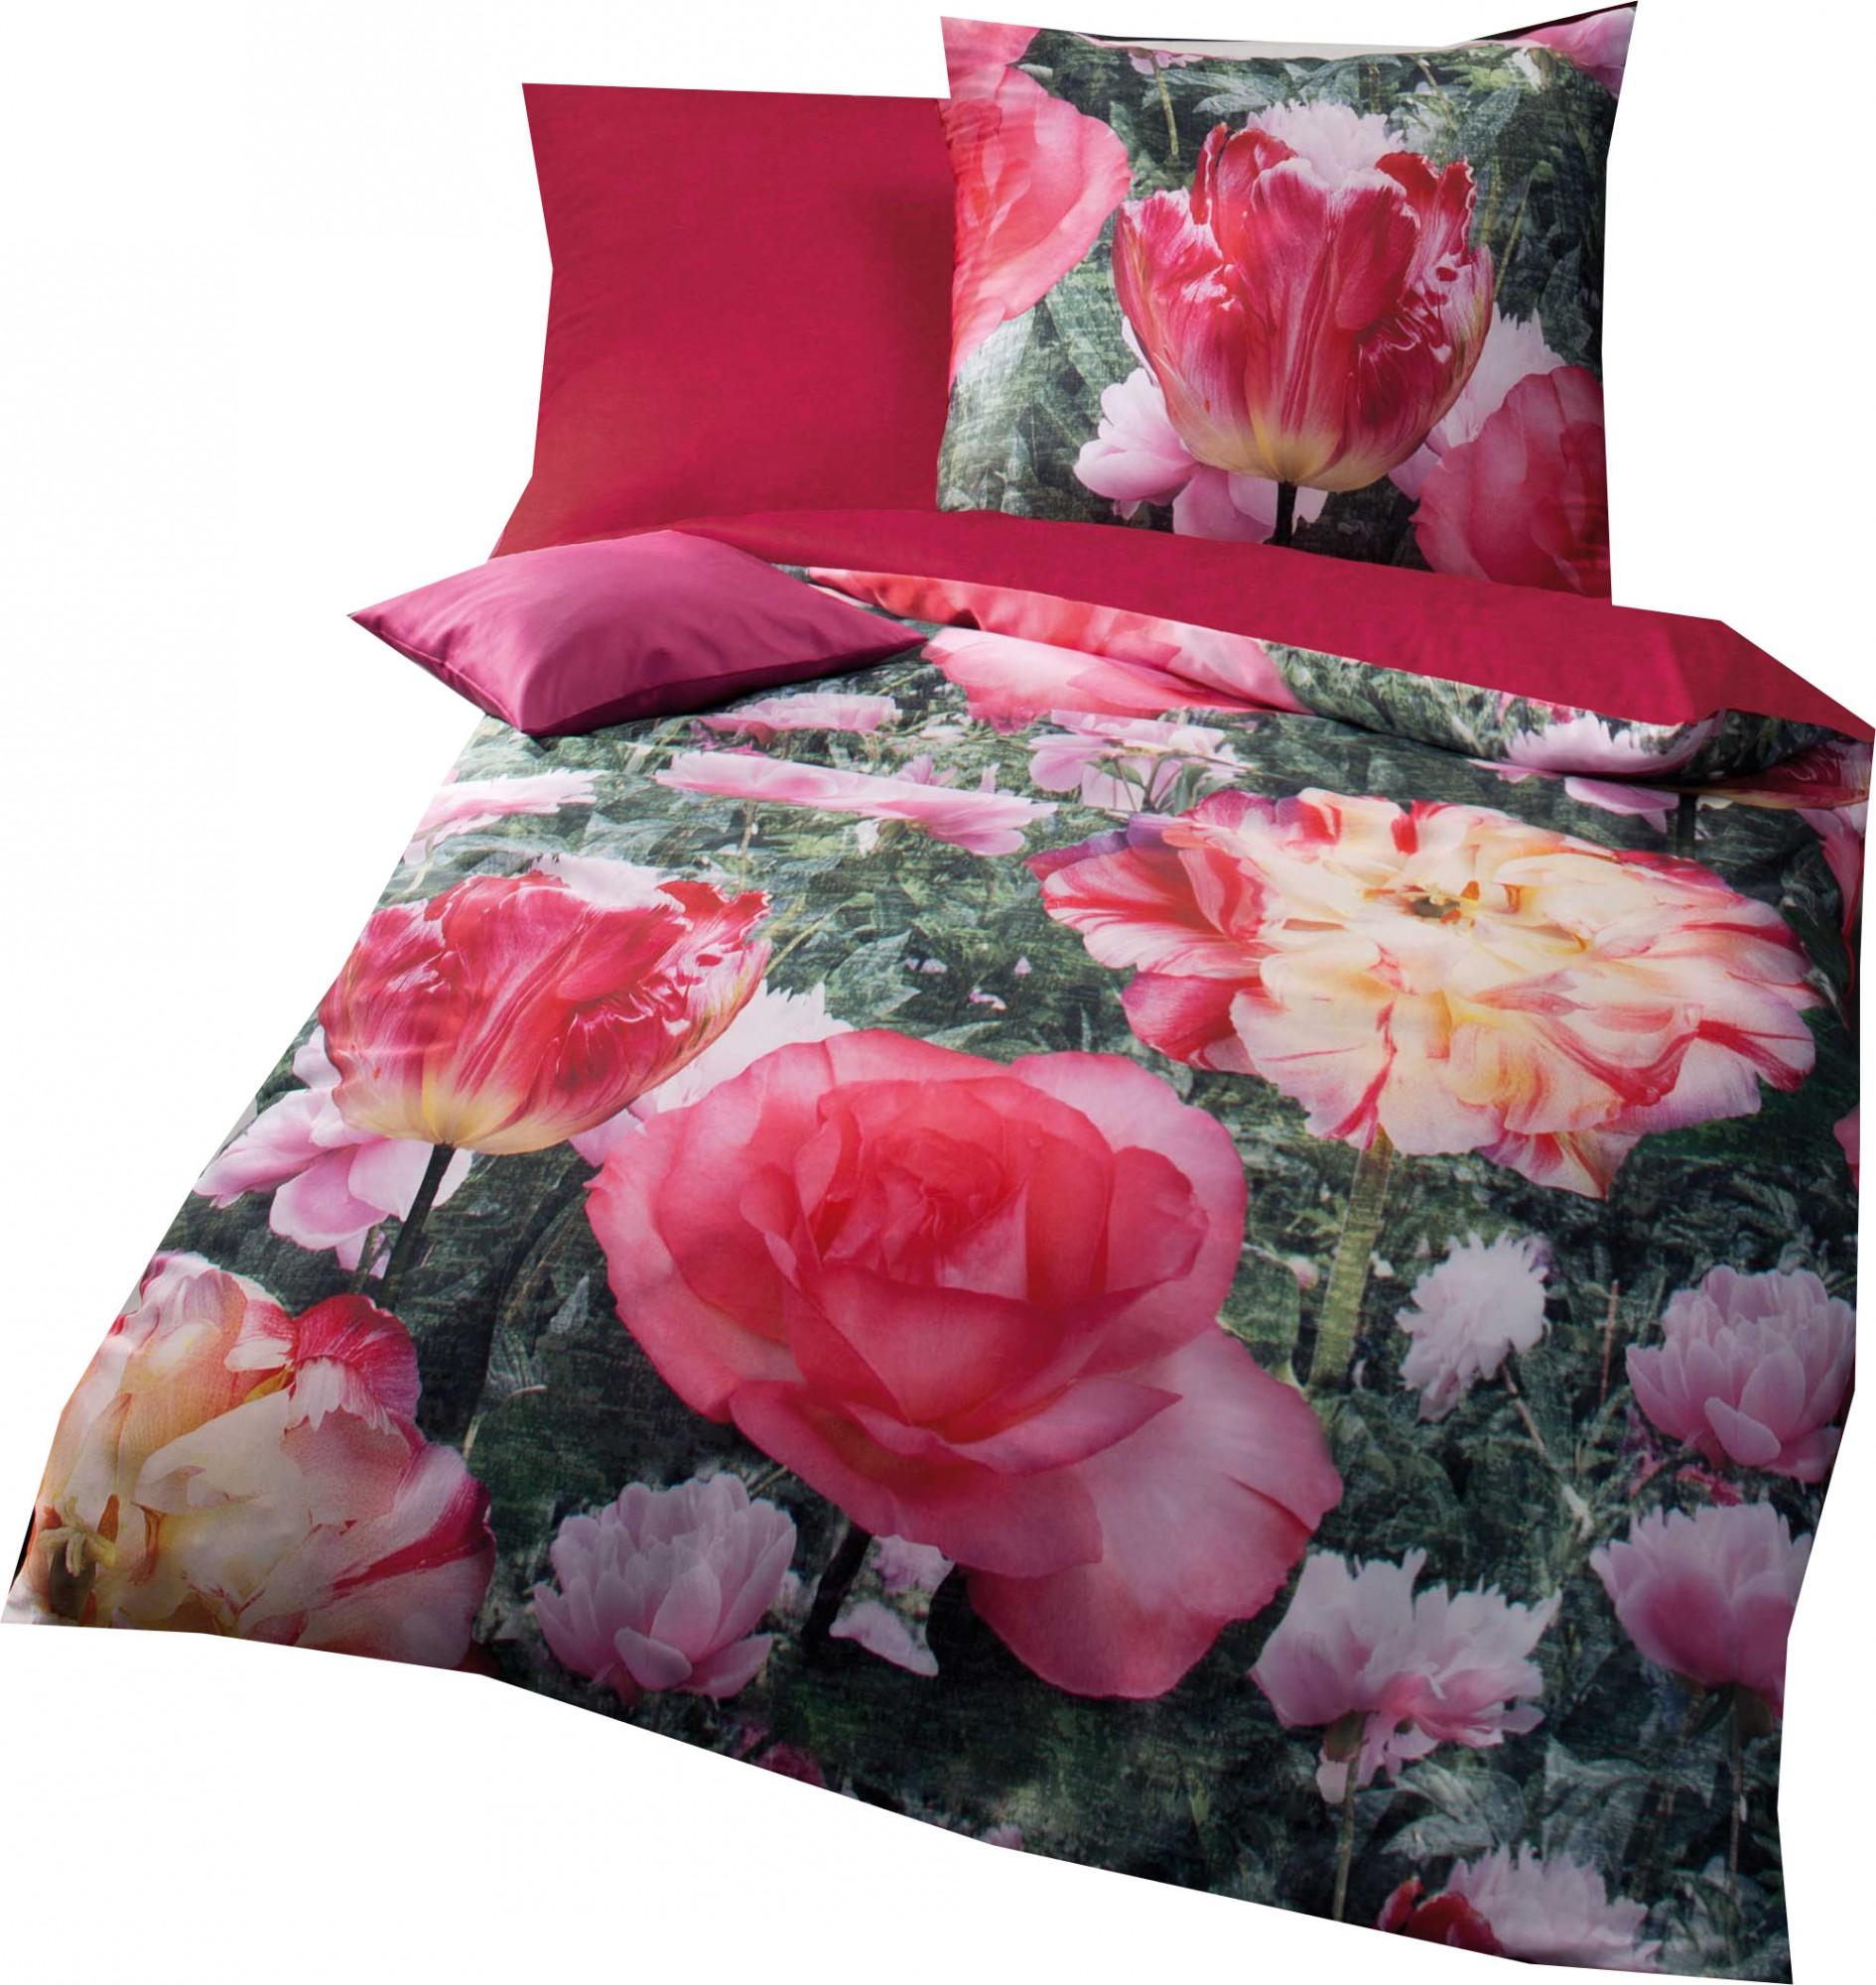 kaeppel mako satin digitaldruck bettw sche wild garden gr e 155x220 80x80 cm farbe pink. Black Bedroom Furniture Sets. Home Design Ideas